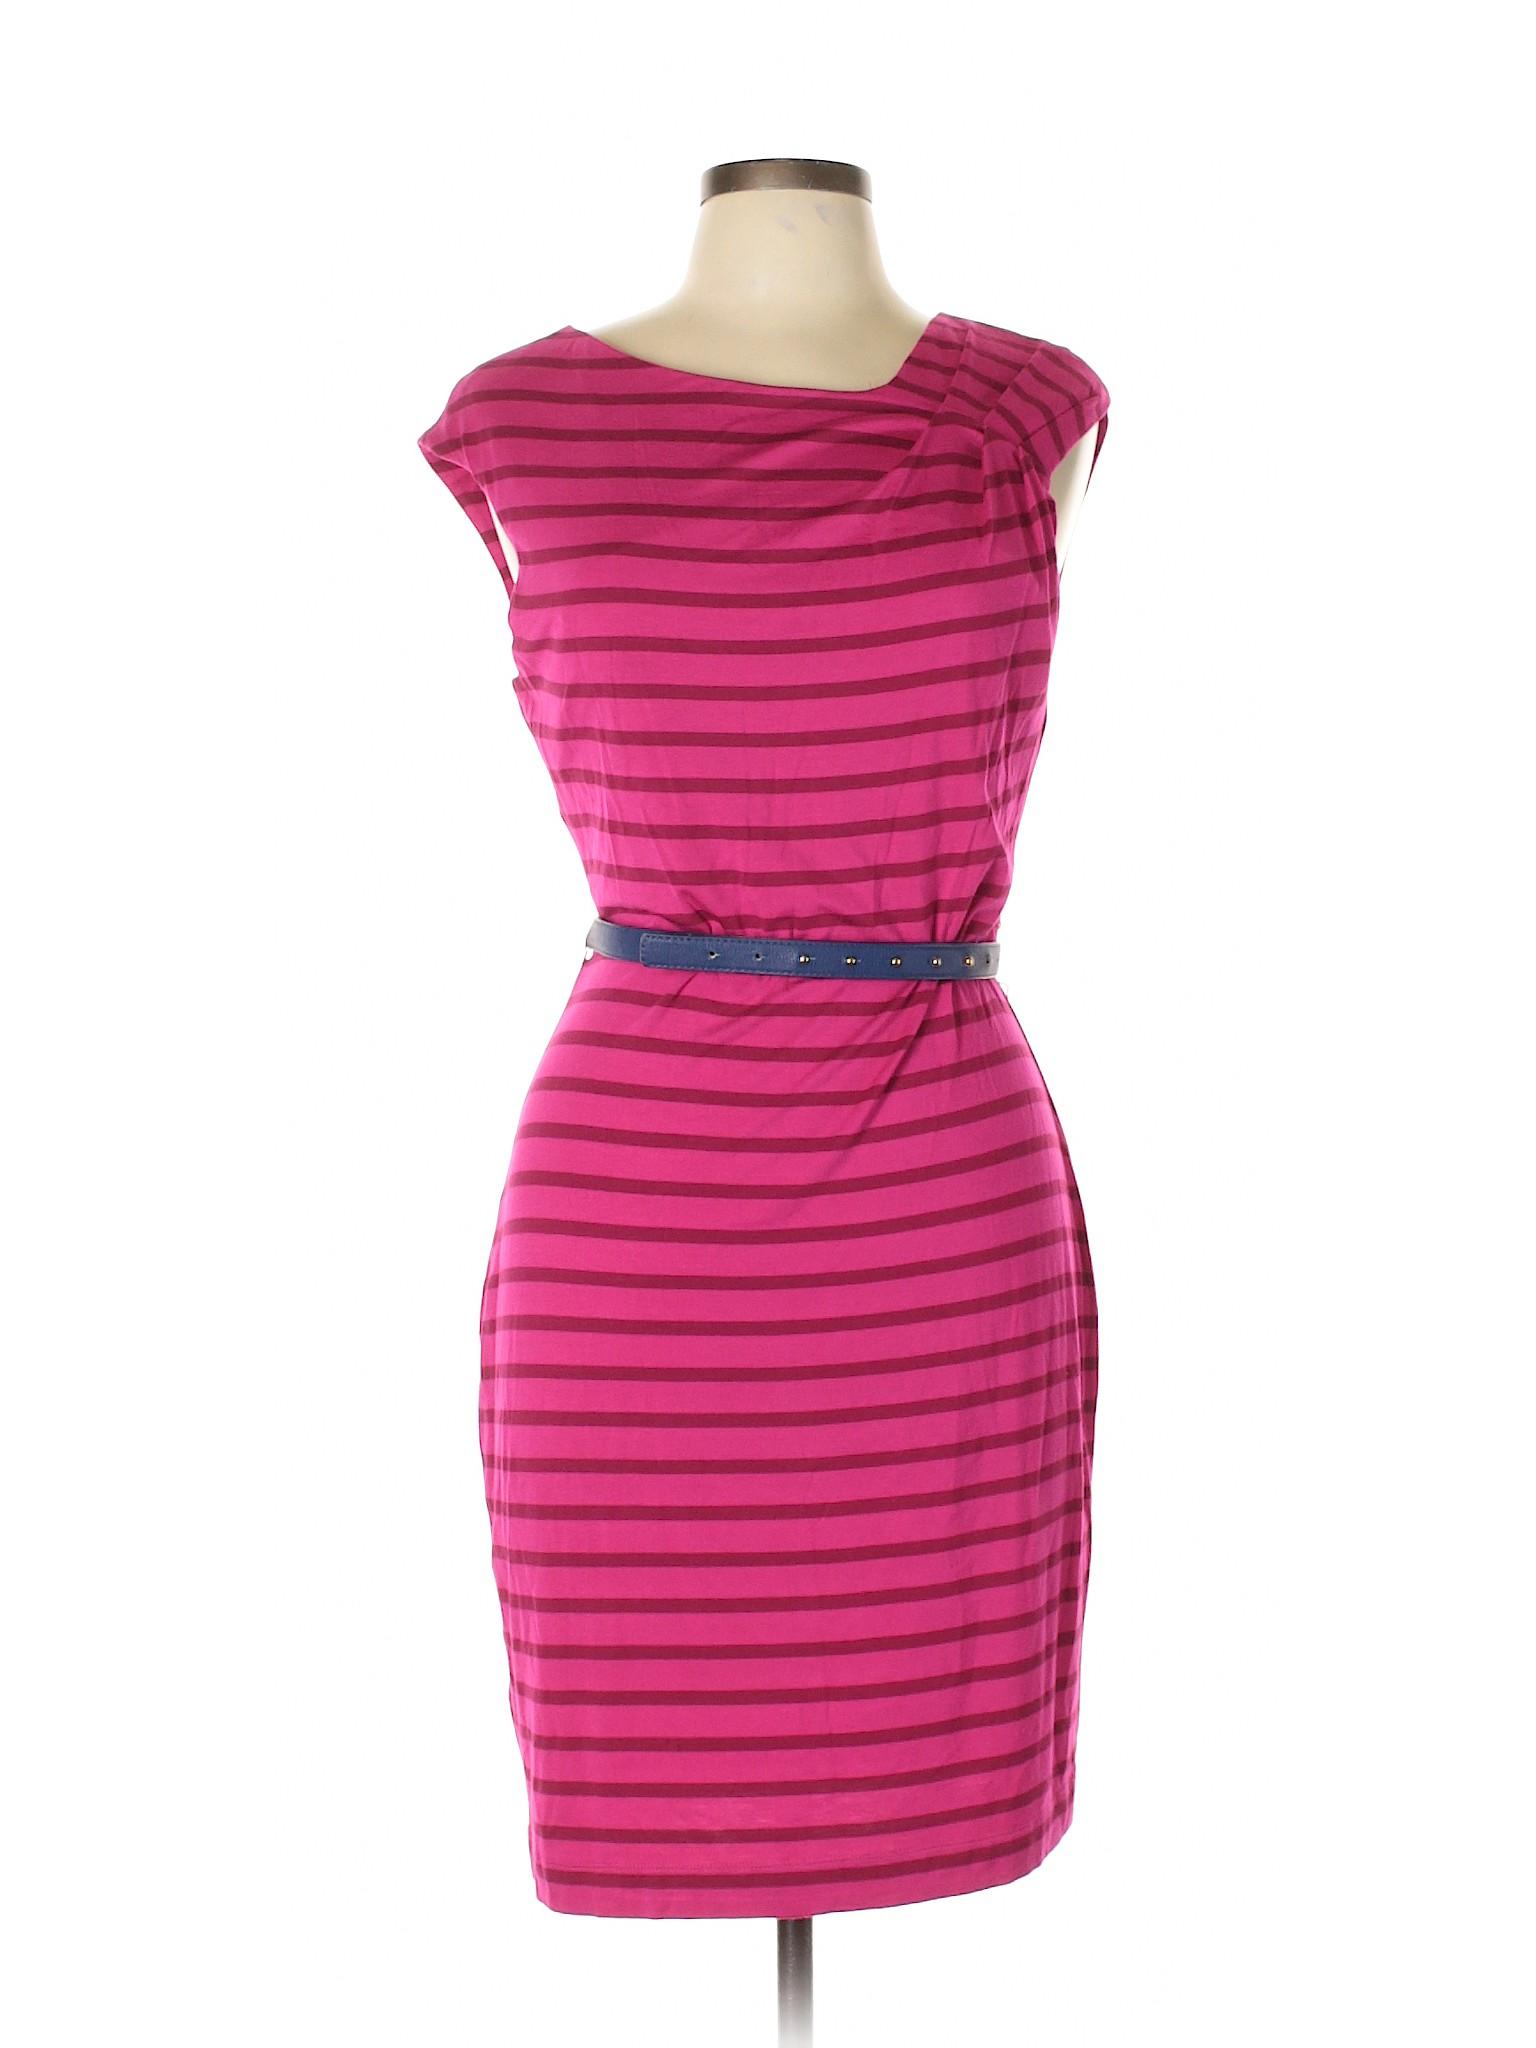 Klein winter Calvin Dress Casual Boutique RE0qdwR